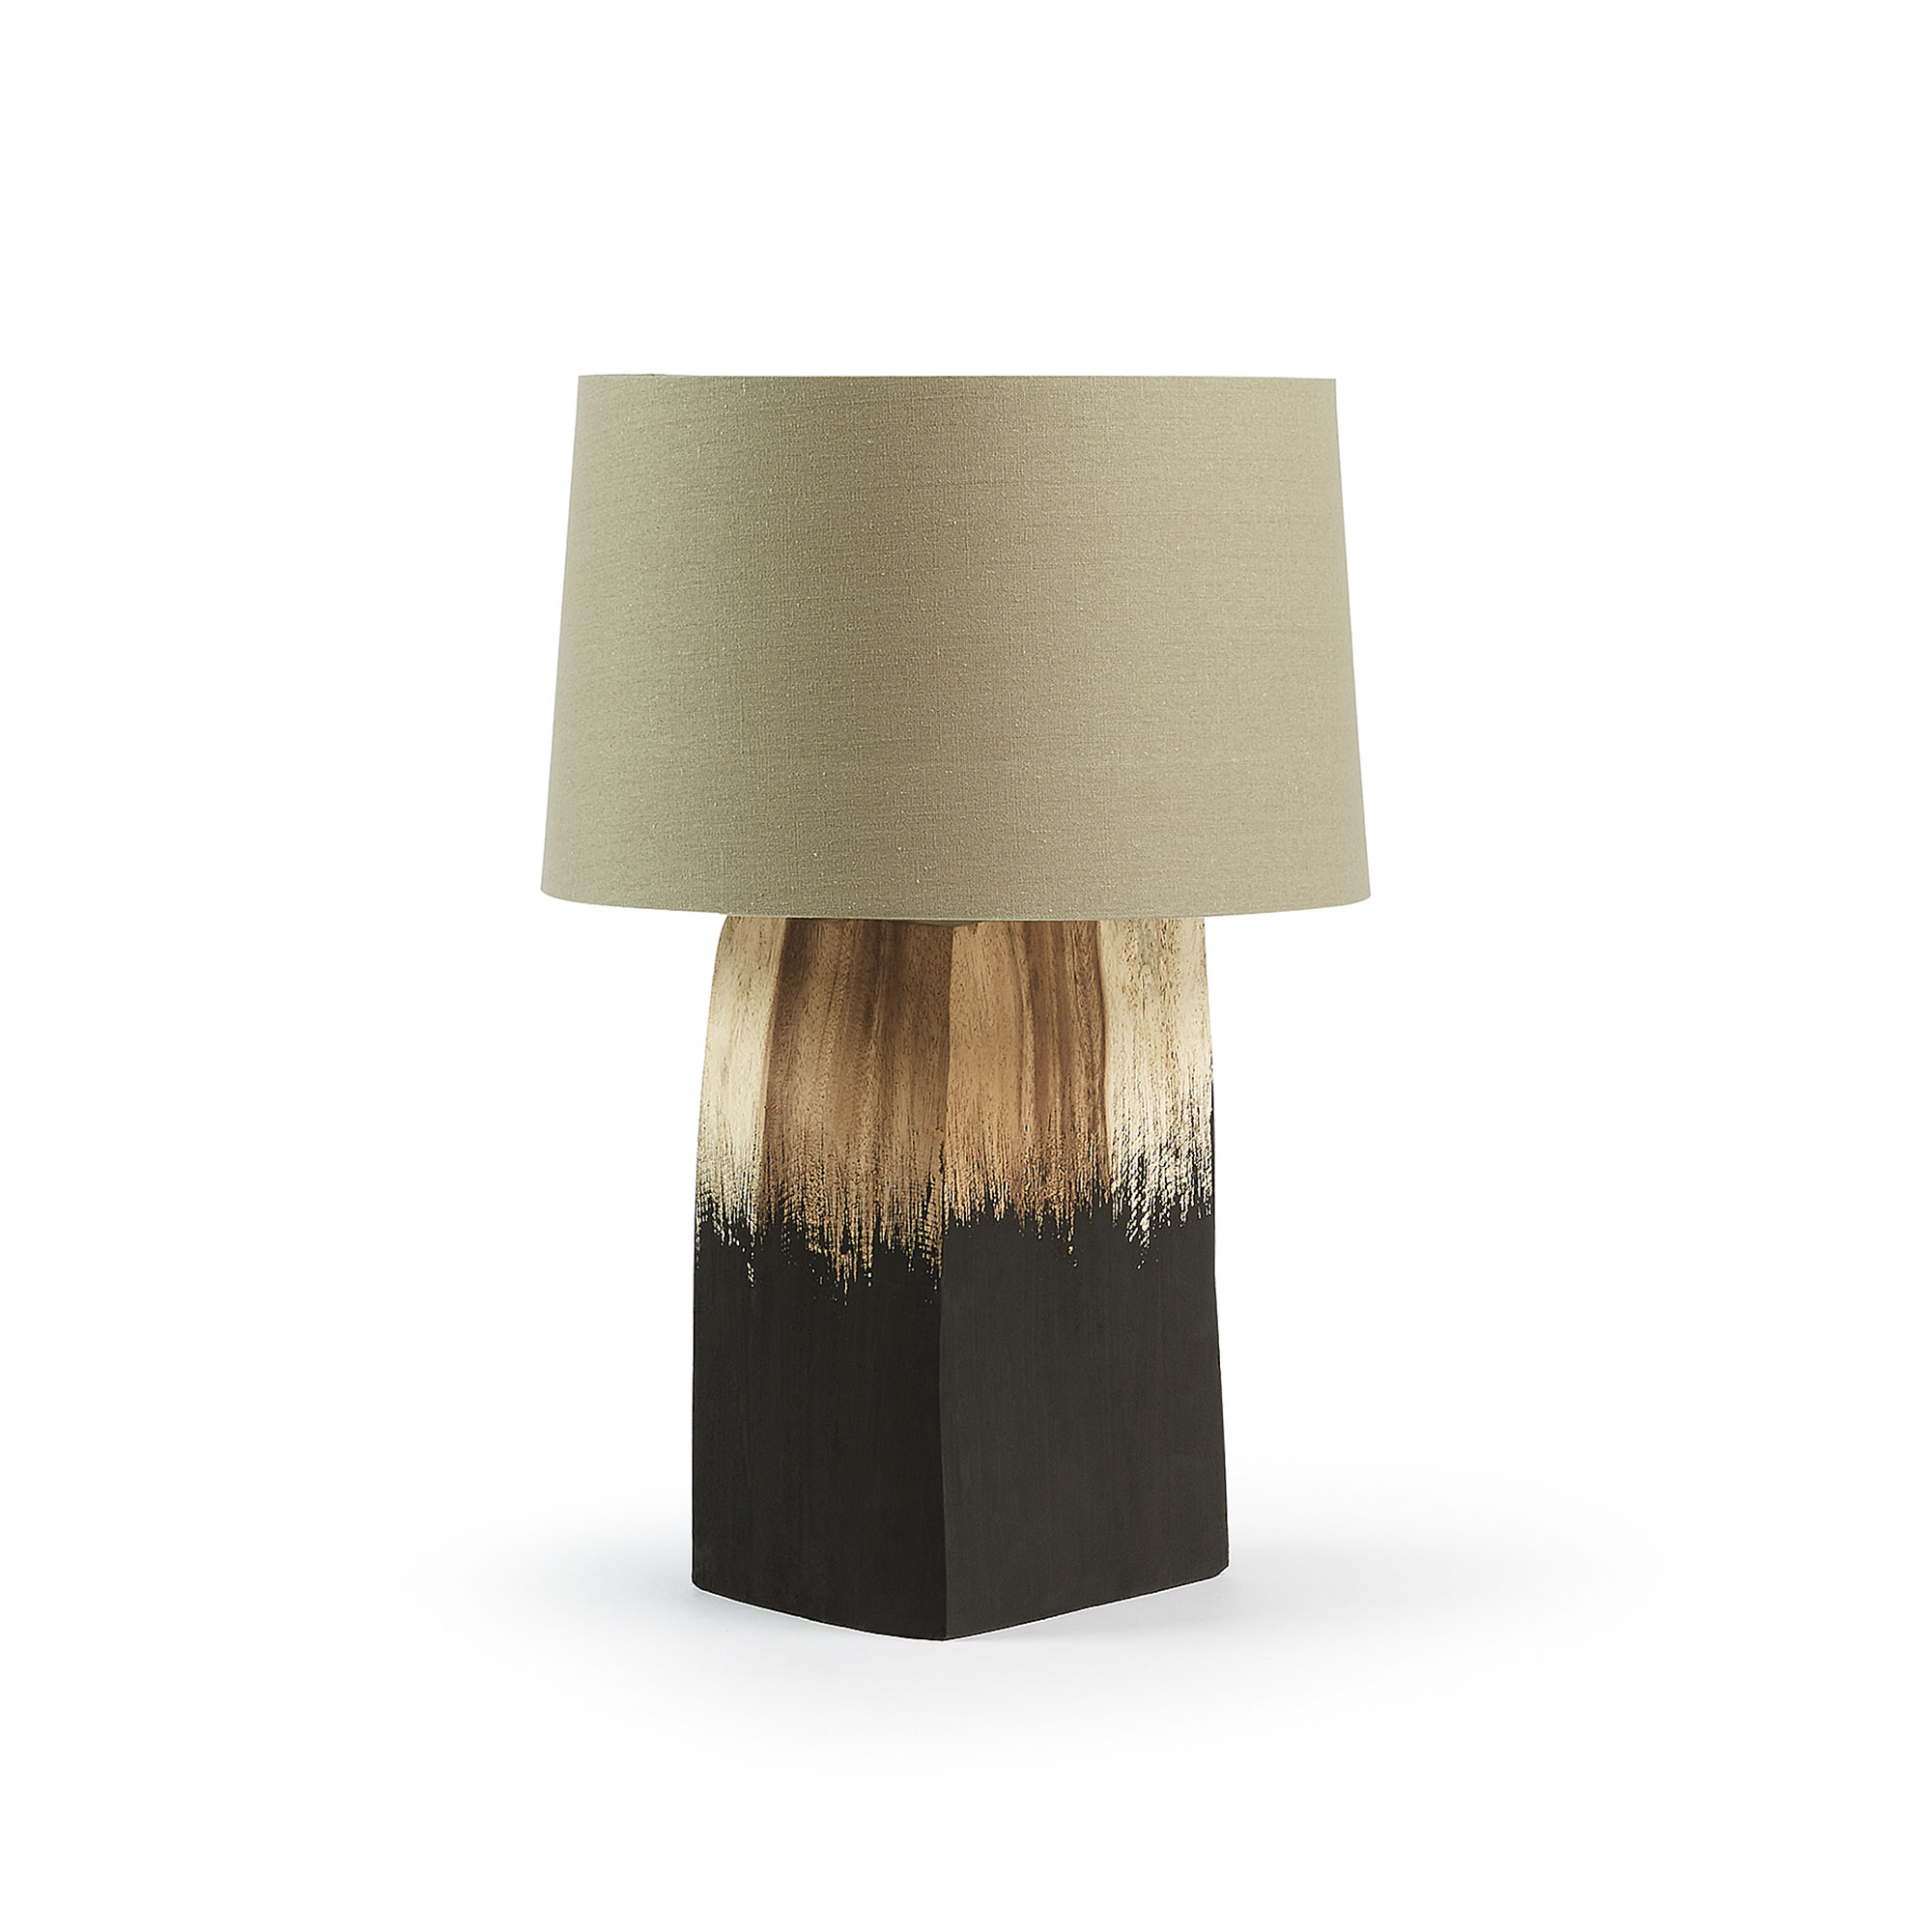 Tafellamp zwart met hout